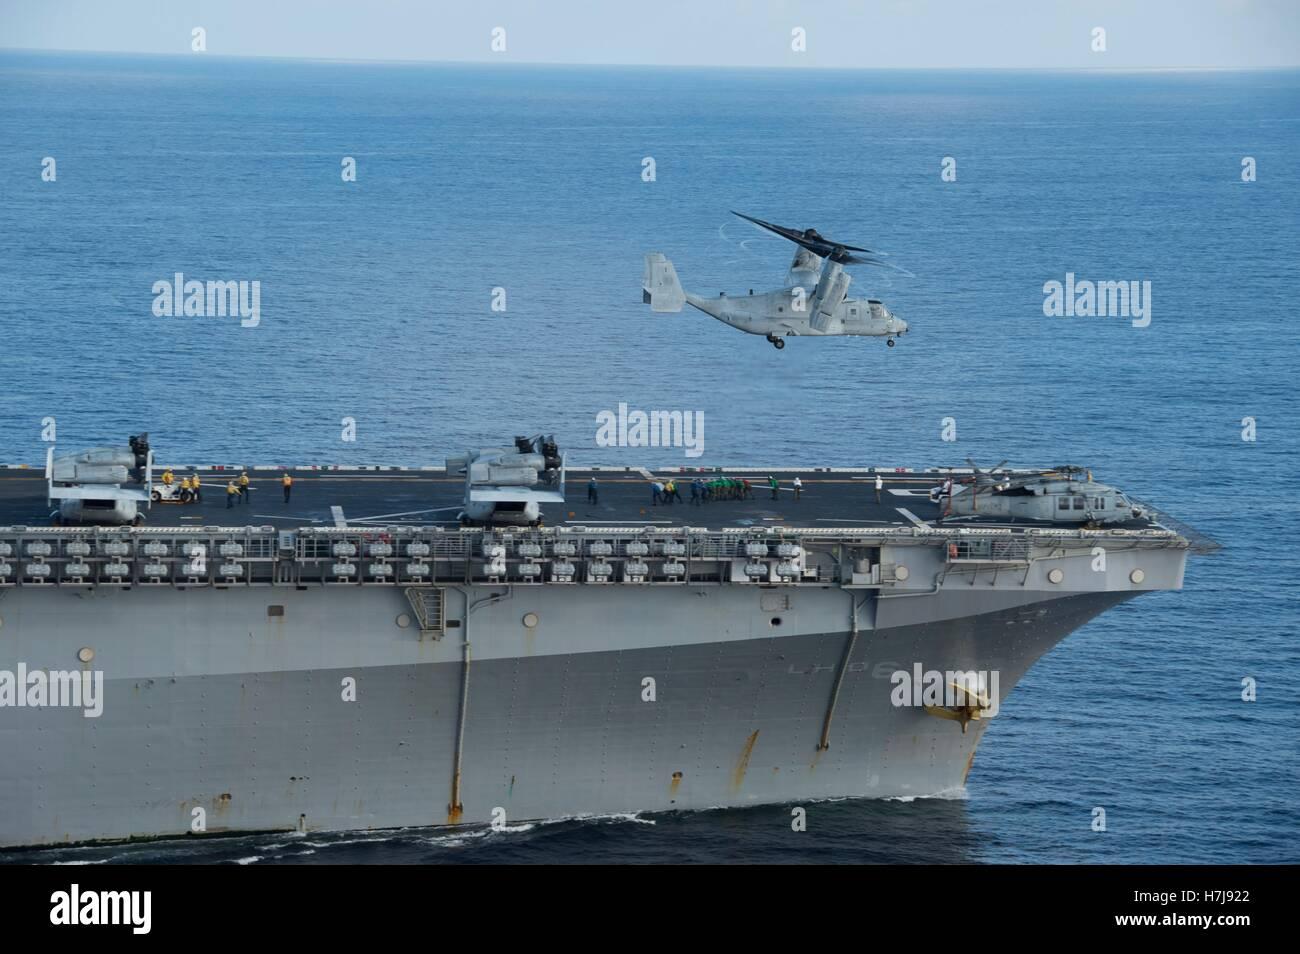 An MV-22B Osprey aircraft launches from the flight deck of the USN Wasp-class amphibious assault ship USS Bonhomme - Stock Image